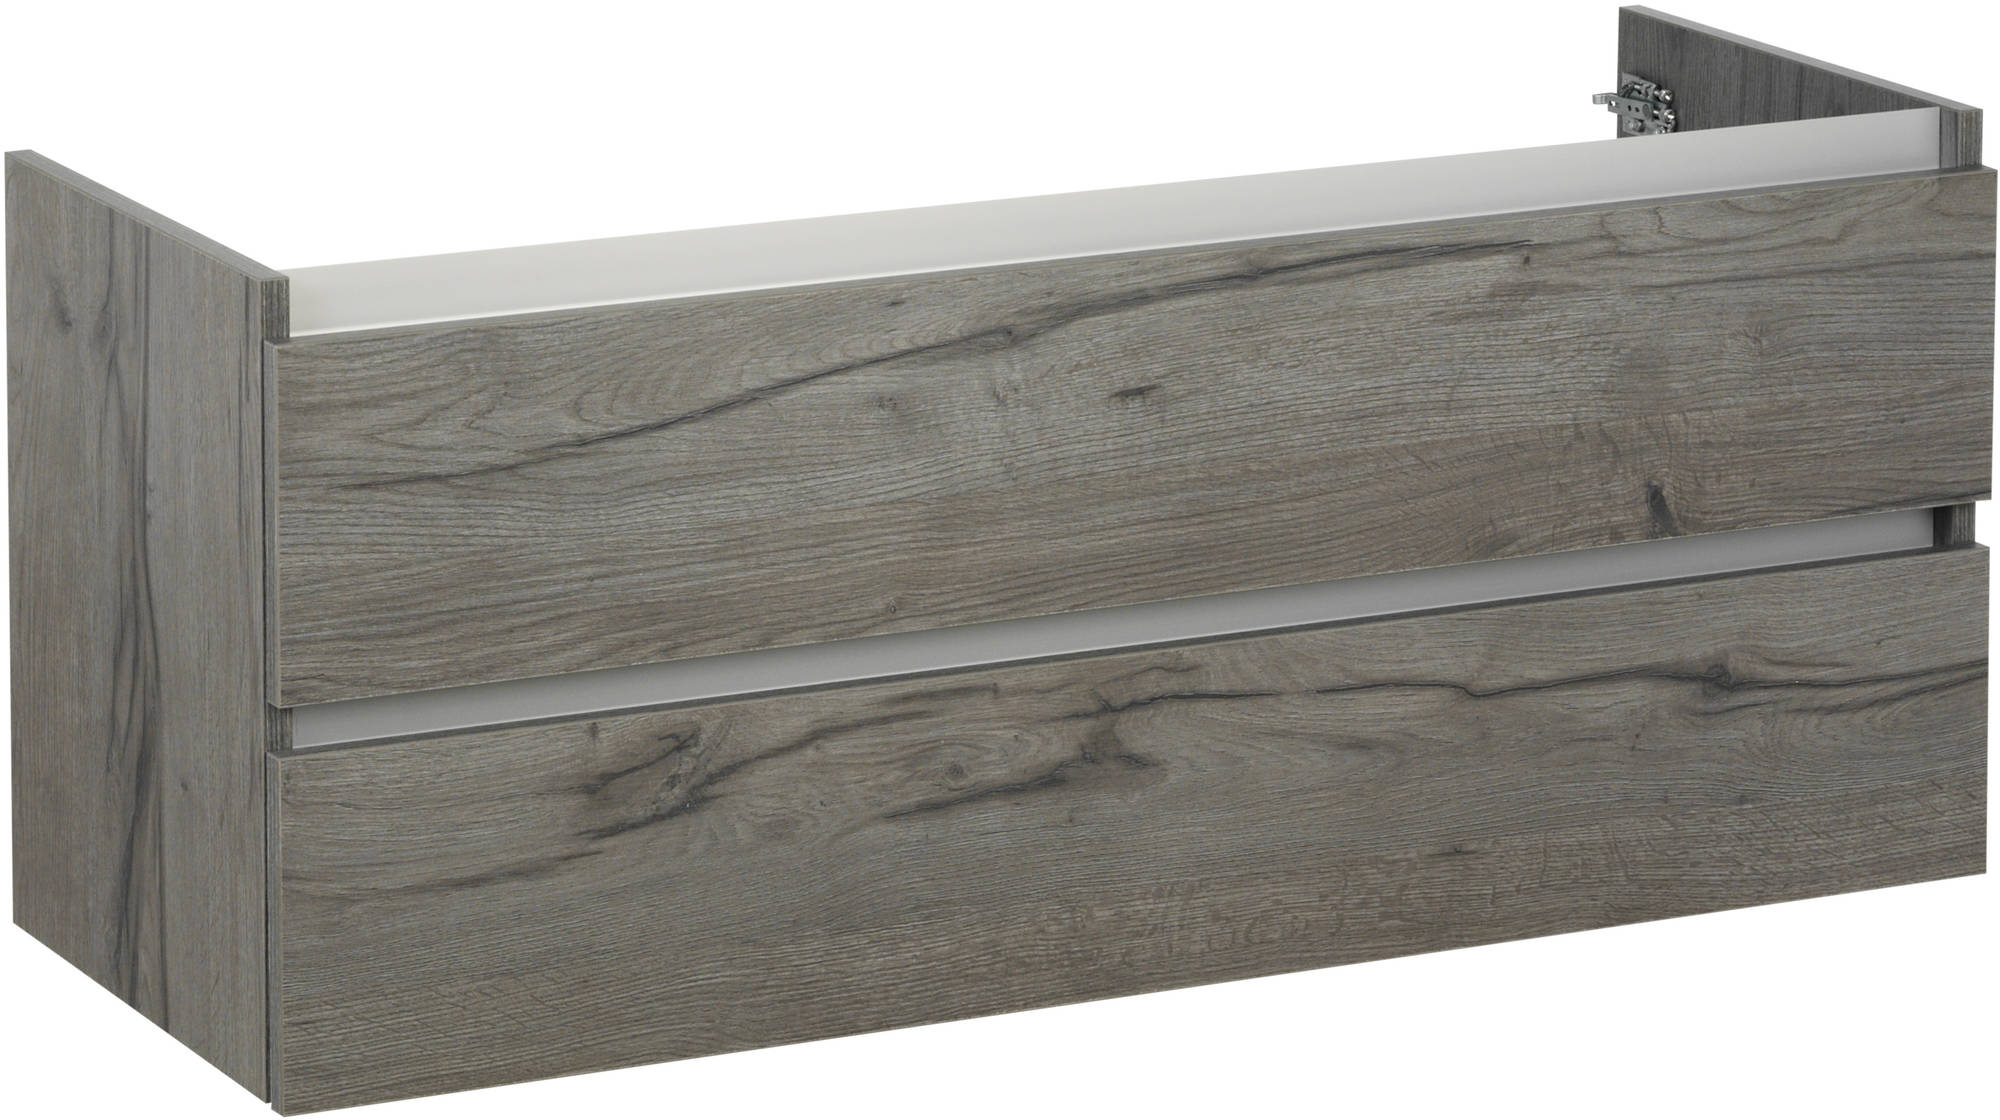 Ben Limara Wastafelonderkast 120x44,5x50cm Cape Elm/Aluminium